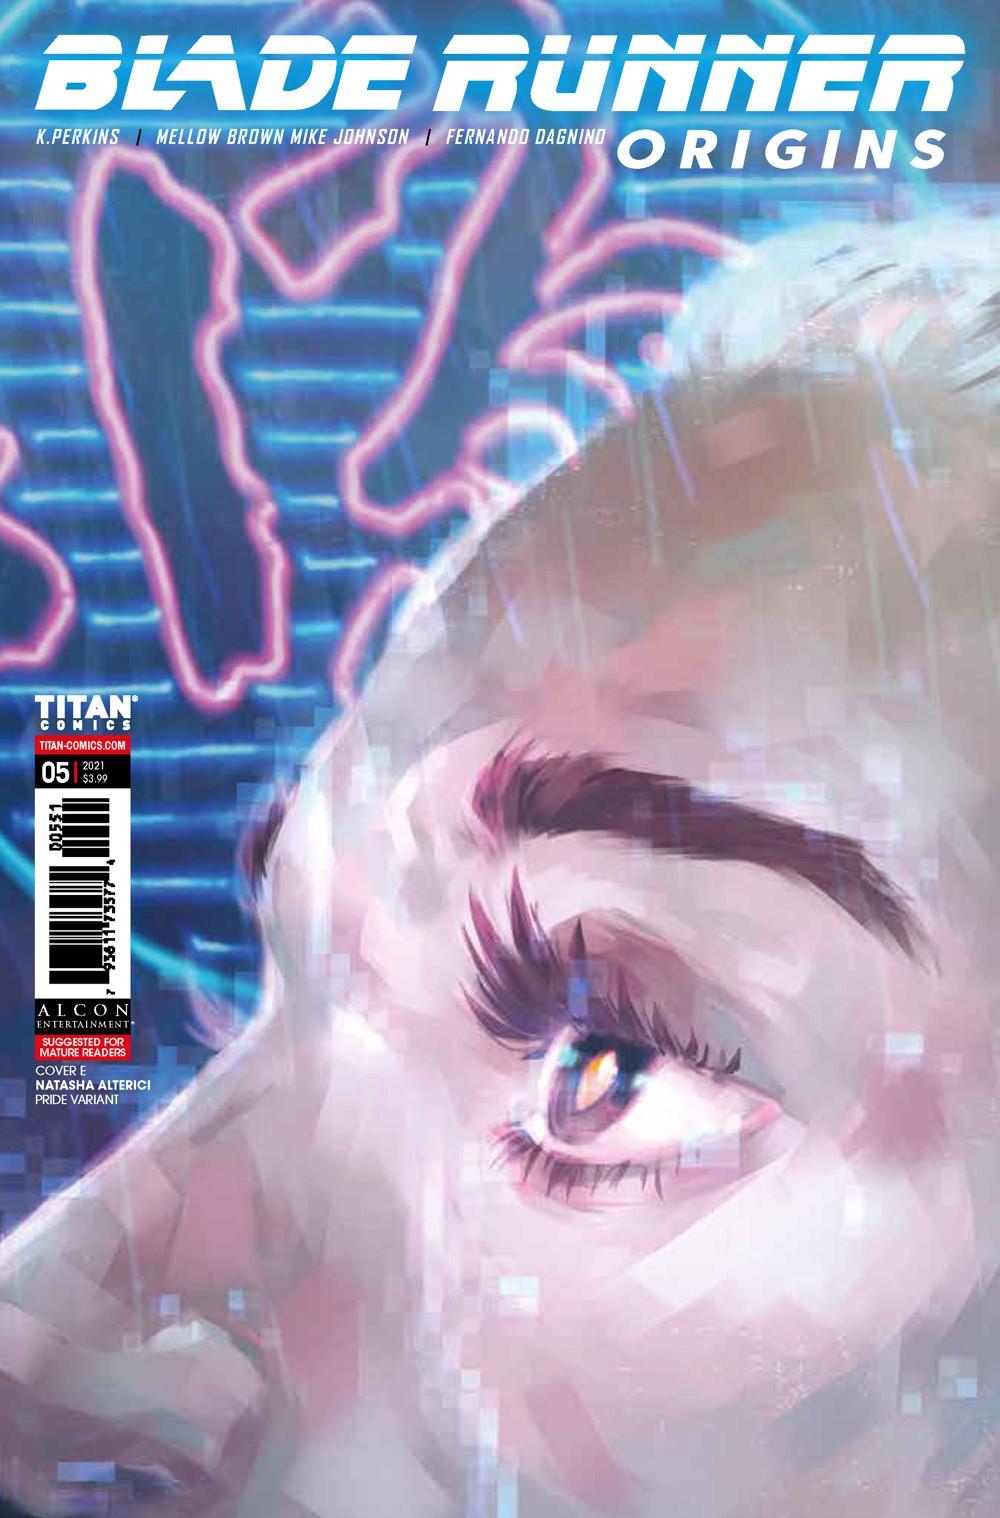 Blade_Runner_Origins_5_COVERS_E ComicList: Titan Comics New Releases for 08/18/2021